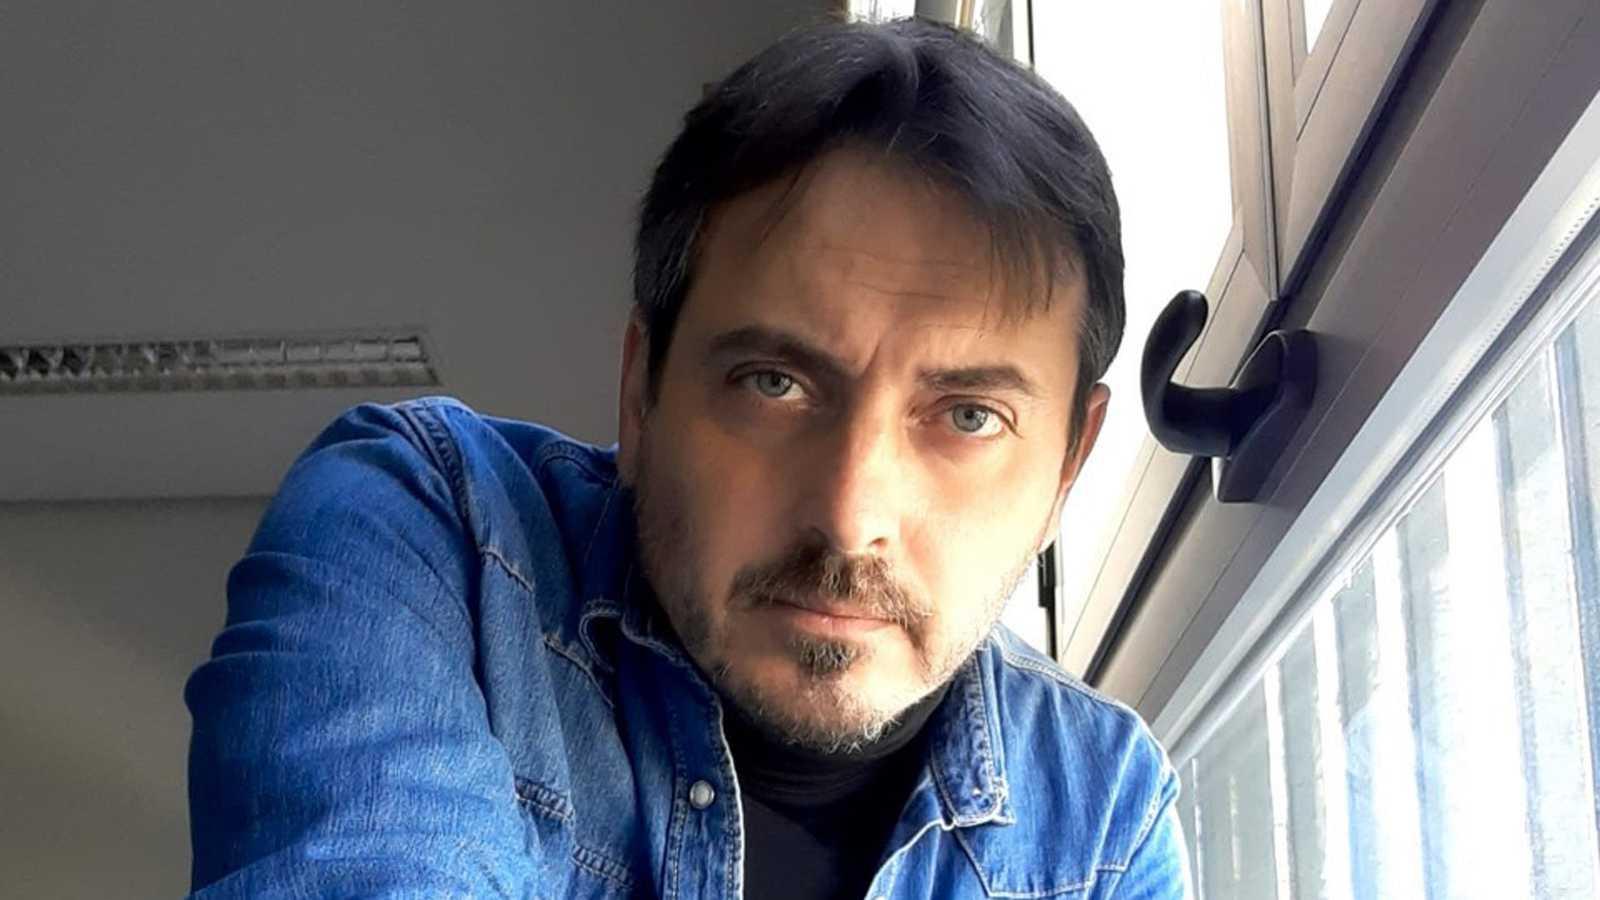 Un idioma sin fronteras - El acento andaluz. Igor Rodríguez Iglesias - 13/03/21 - escuchar ahora